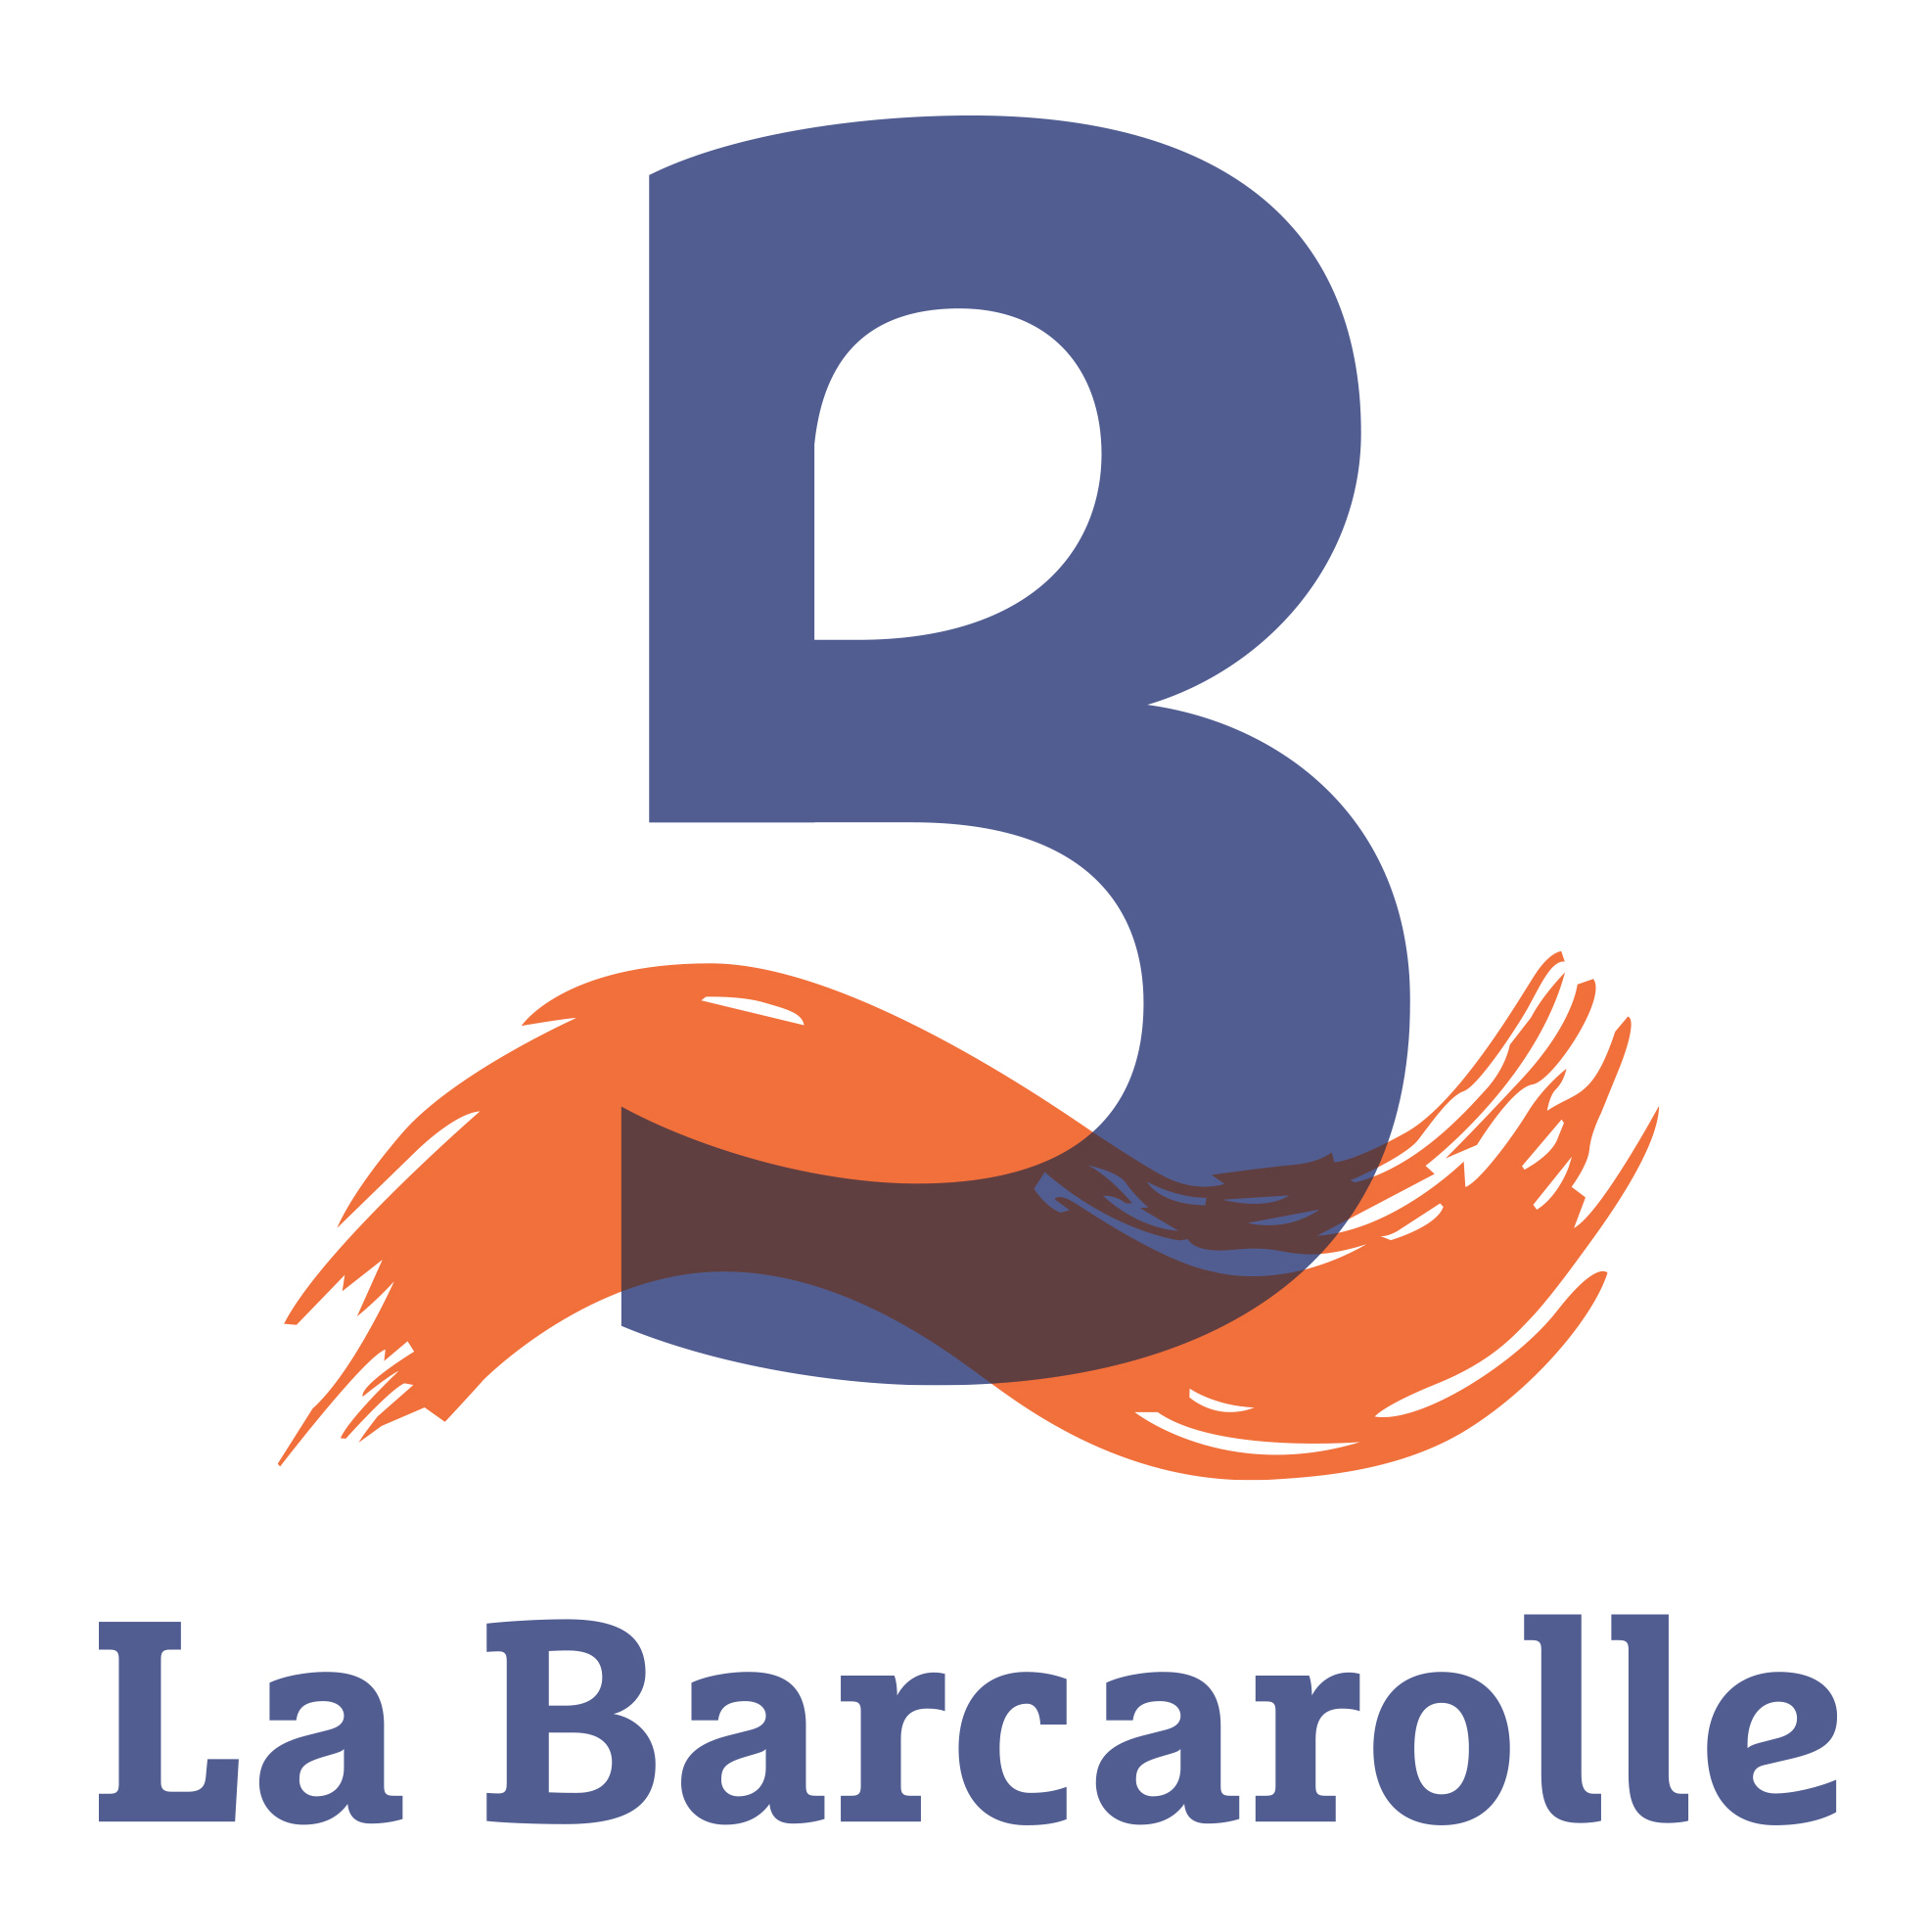 La Barcarolle